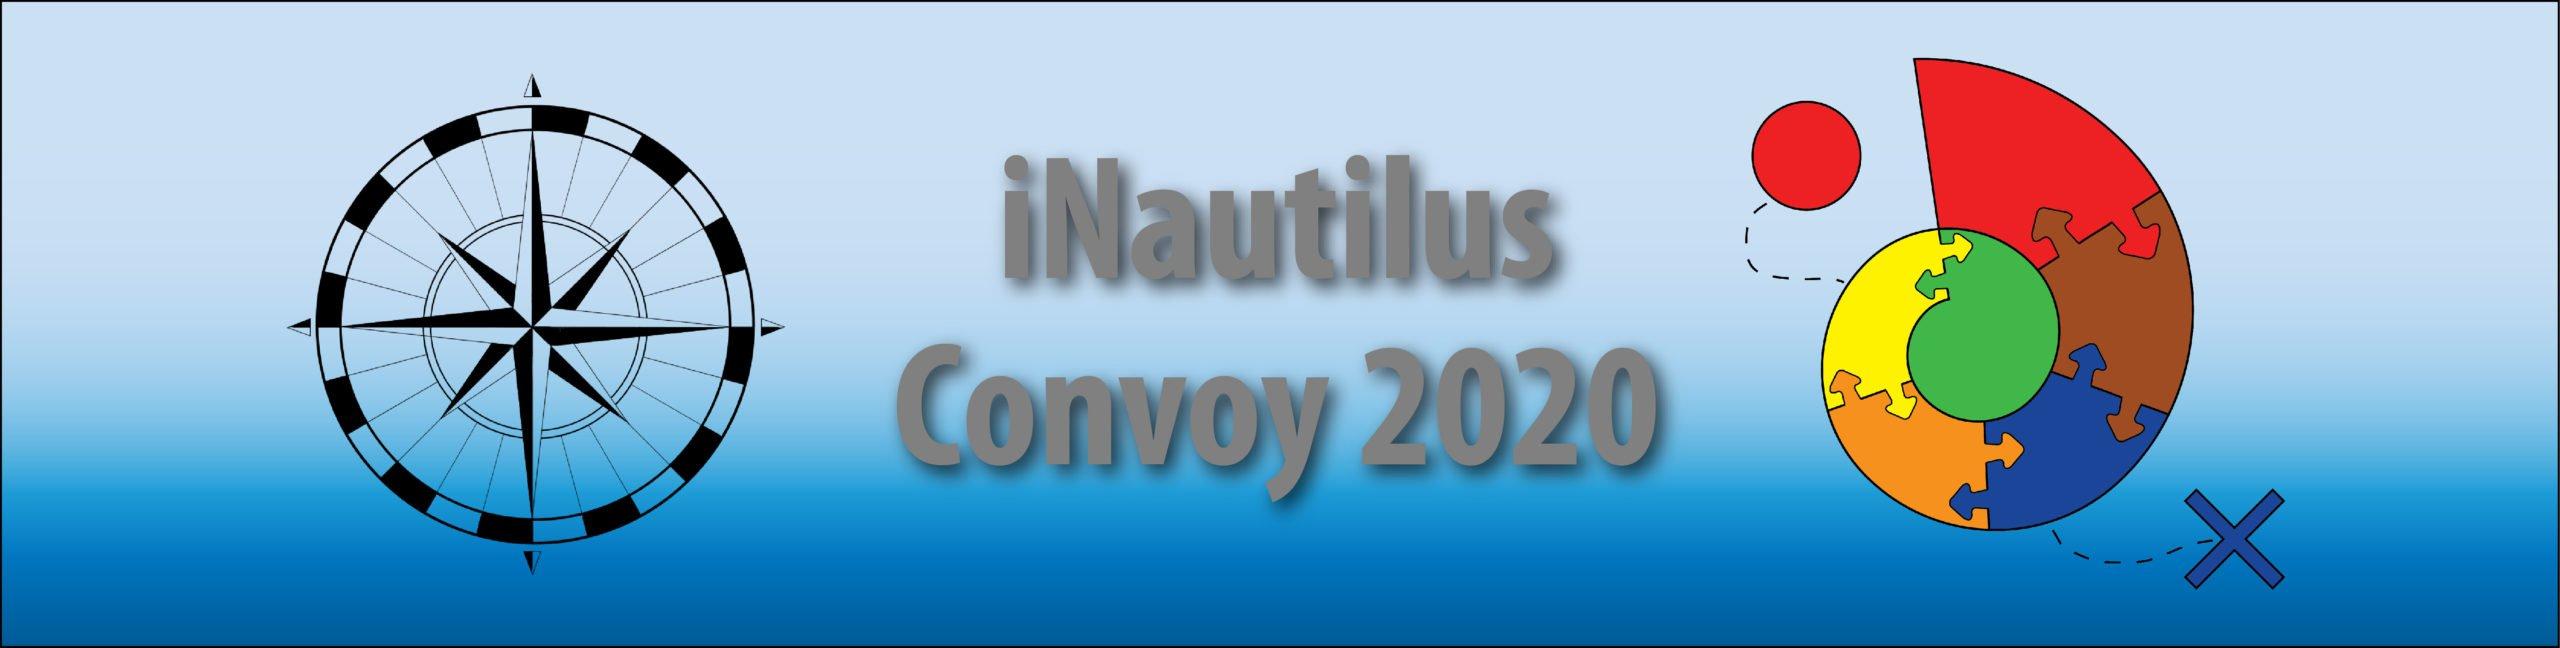 iNautilus-convoy-2020-thin-banner